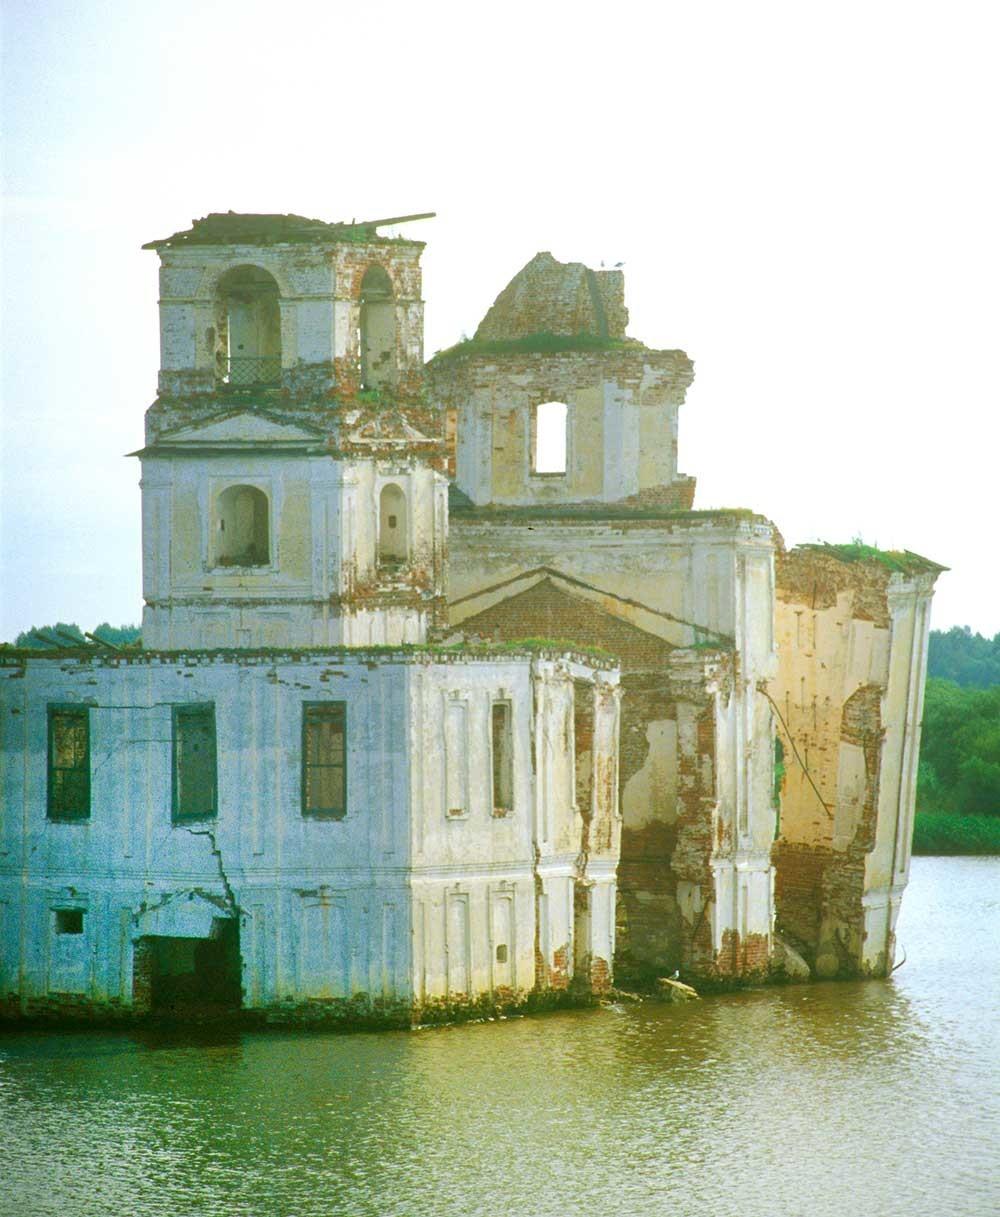 Krokhino. Gereja Kelahiran Kristus, pemandangan barat daya dari Sungai Sheksna. 14 Juli 2007.